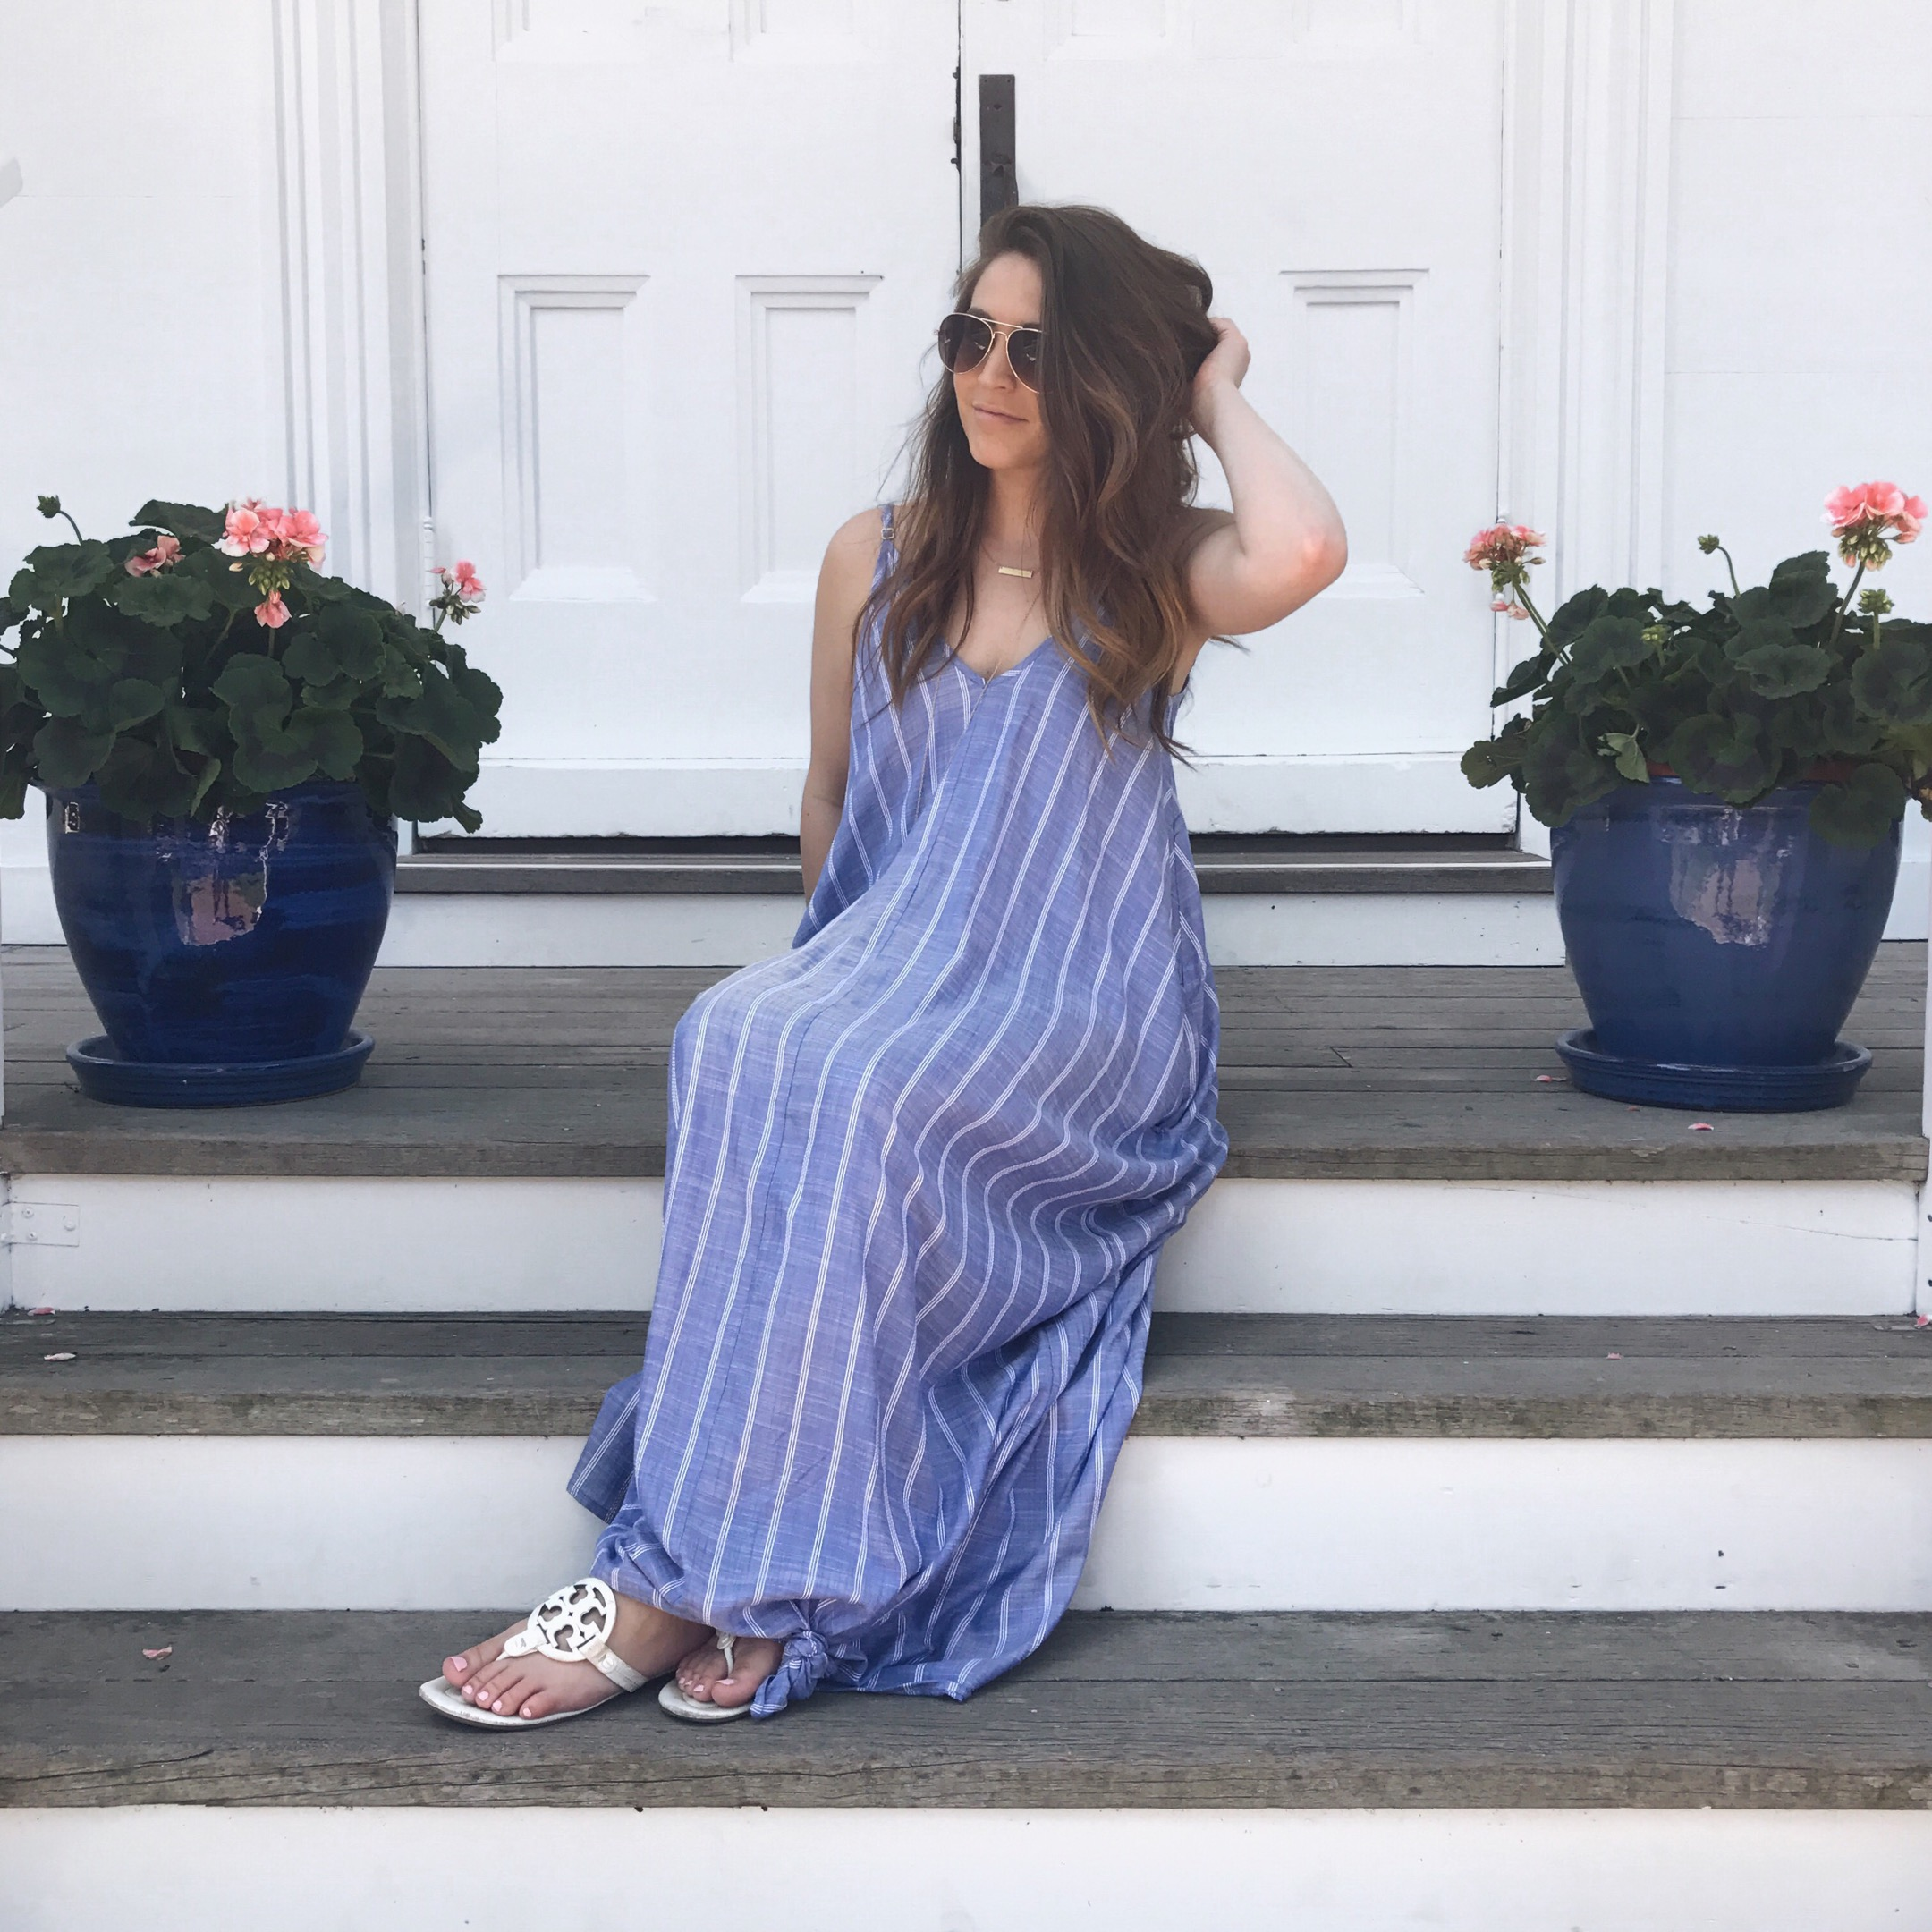 summer outfit idea / blue & white striped maxi dress